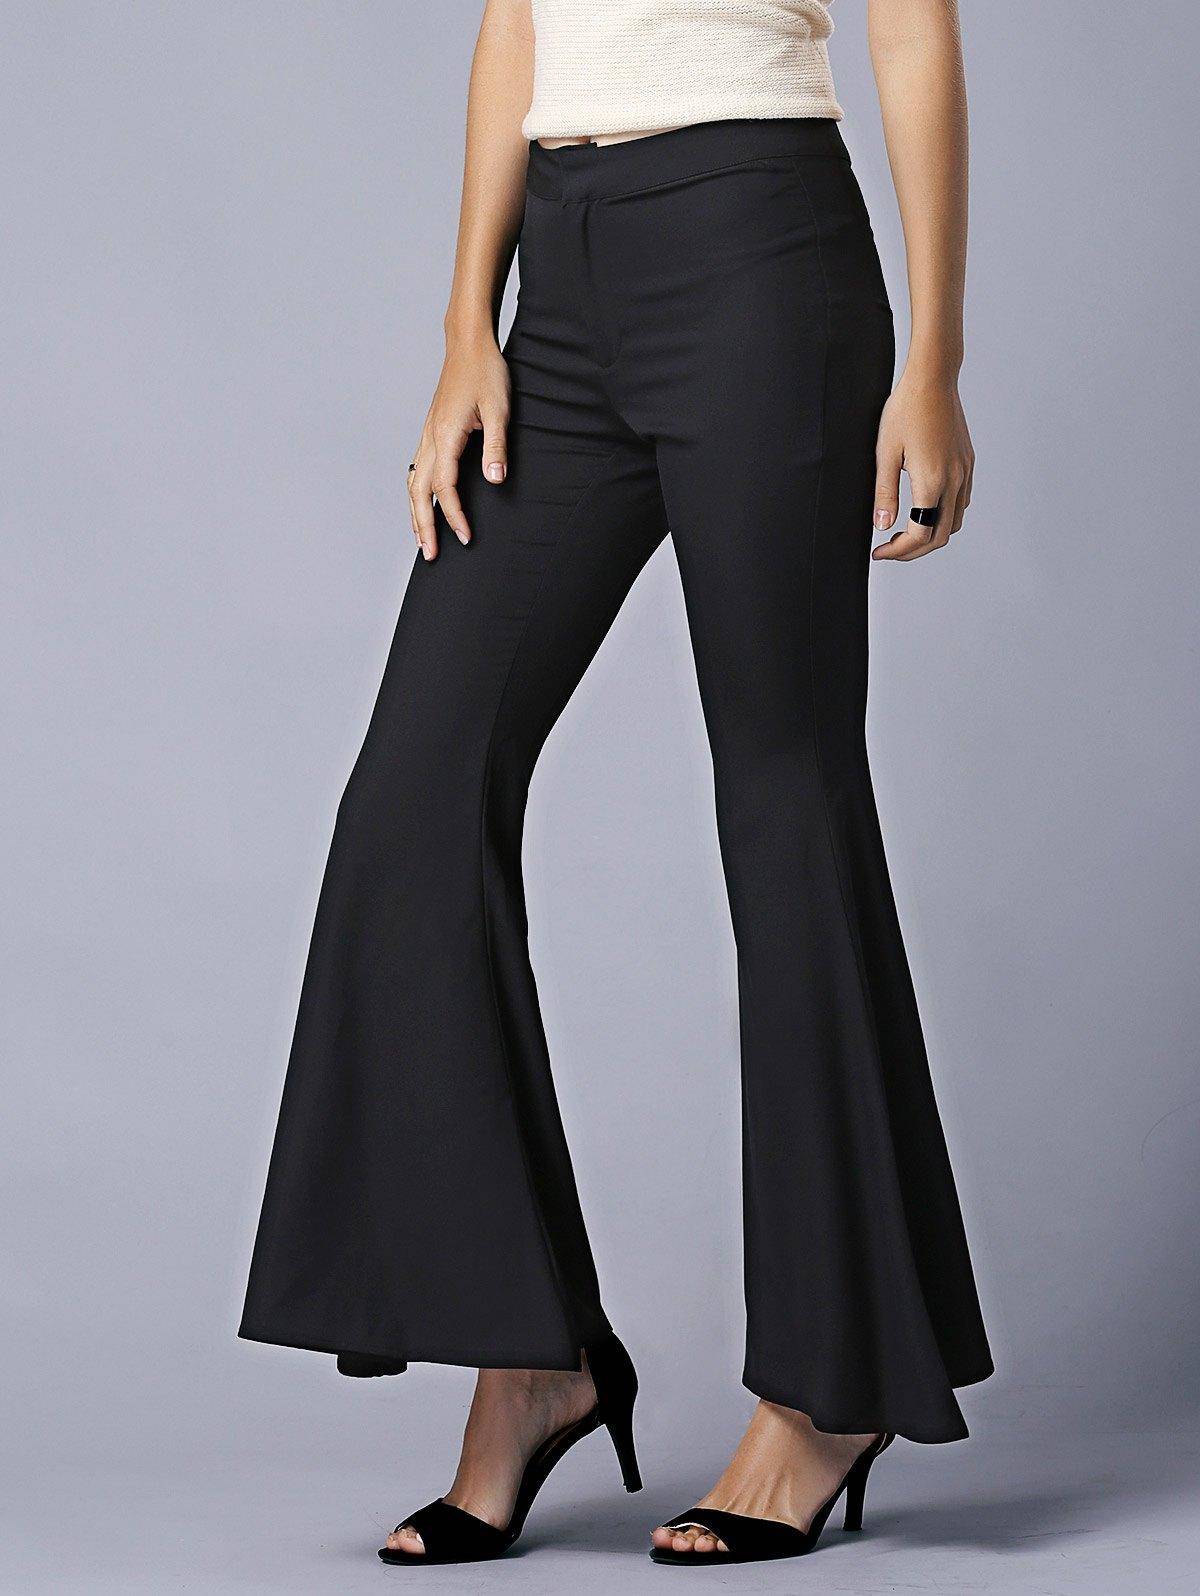 High Waist Black Flare Pants